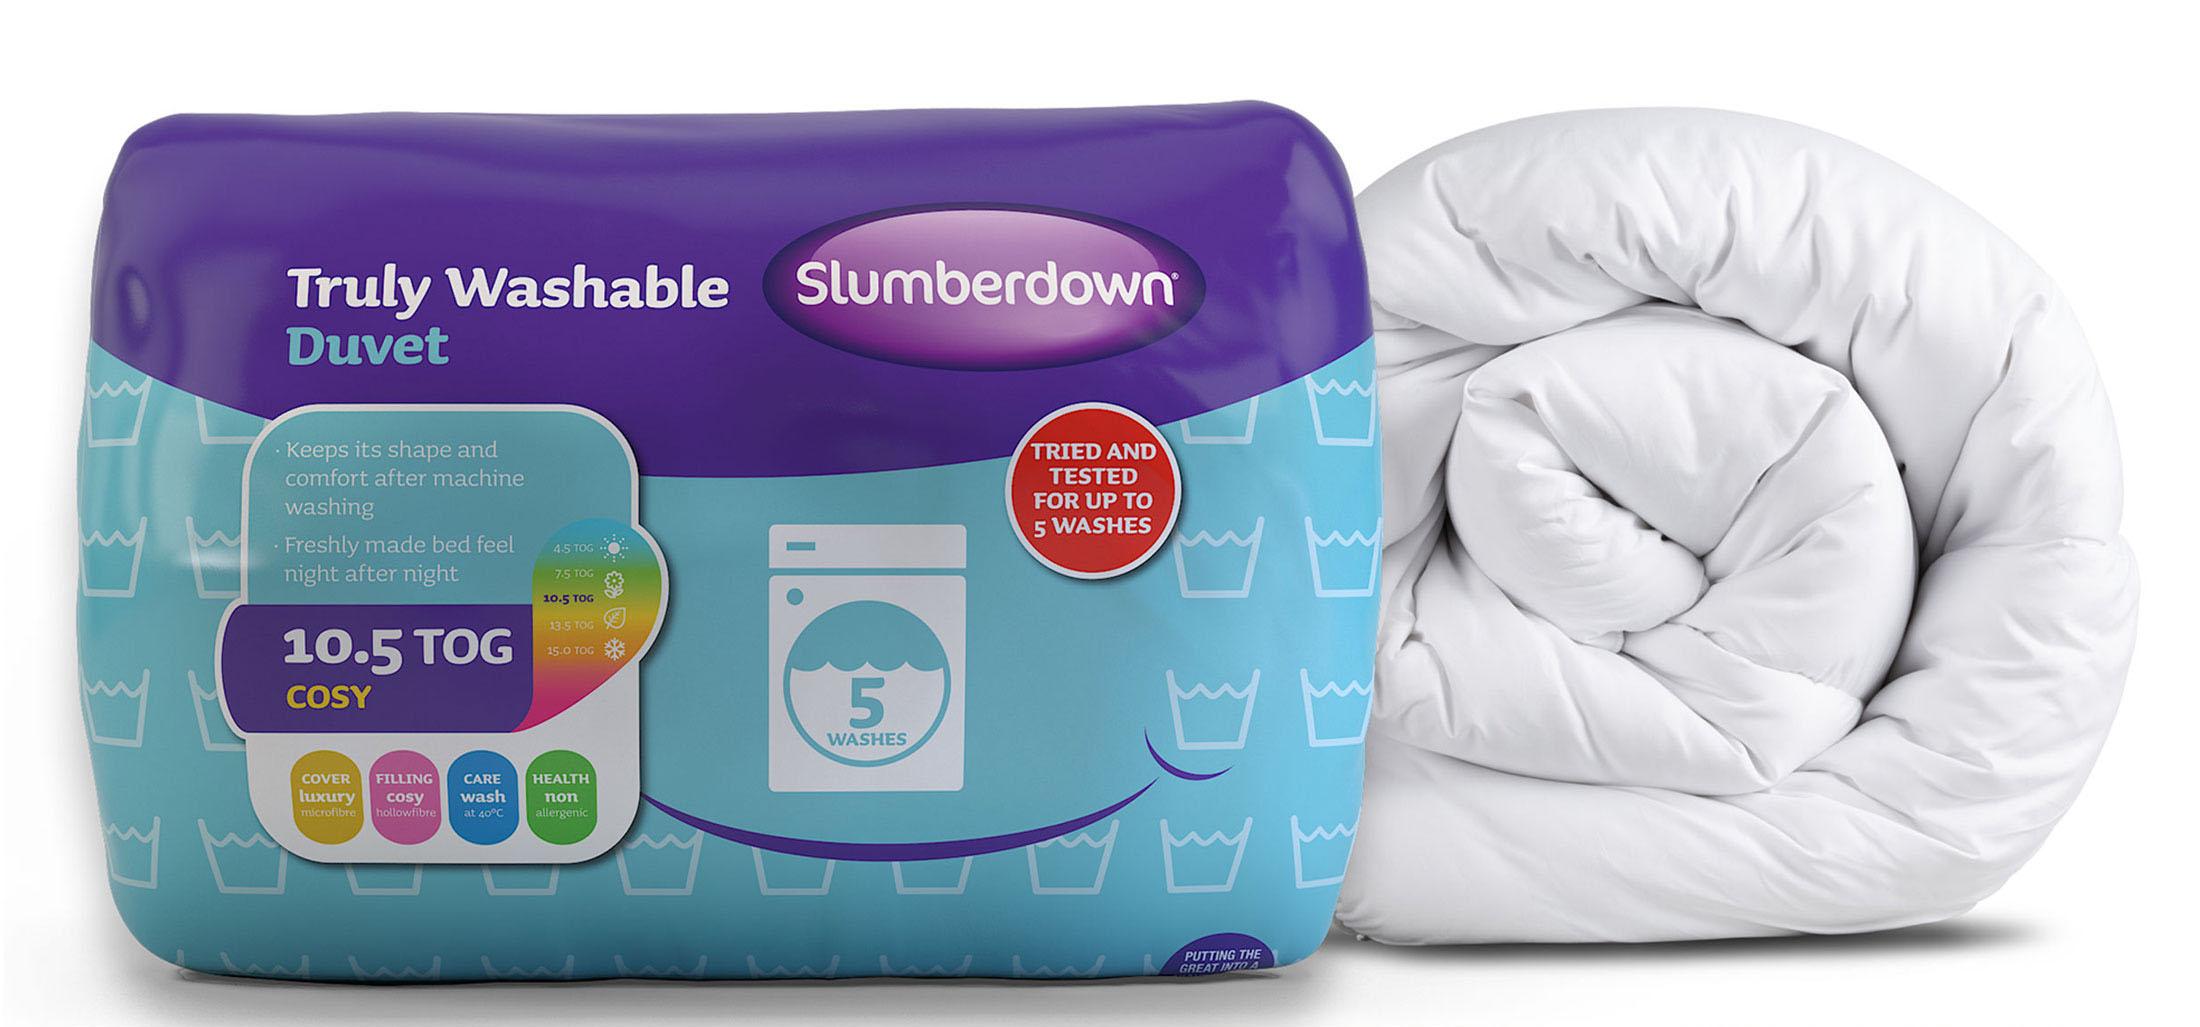 slumberdown - casestudy